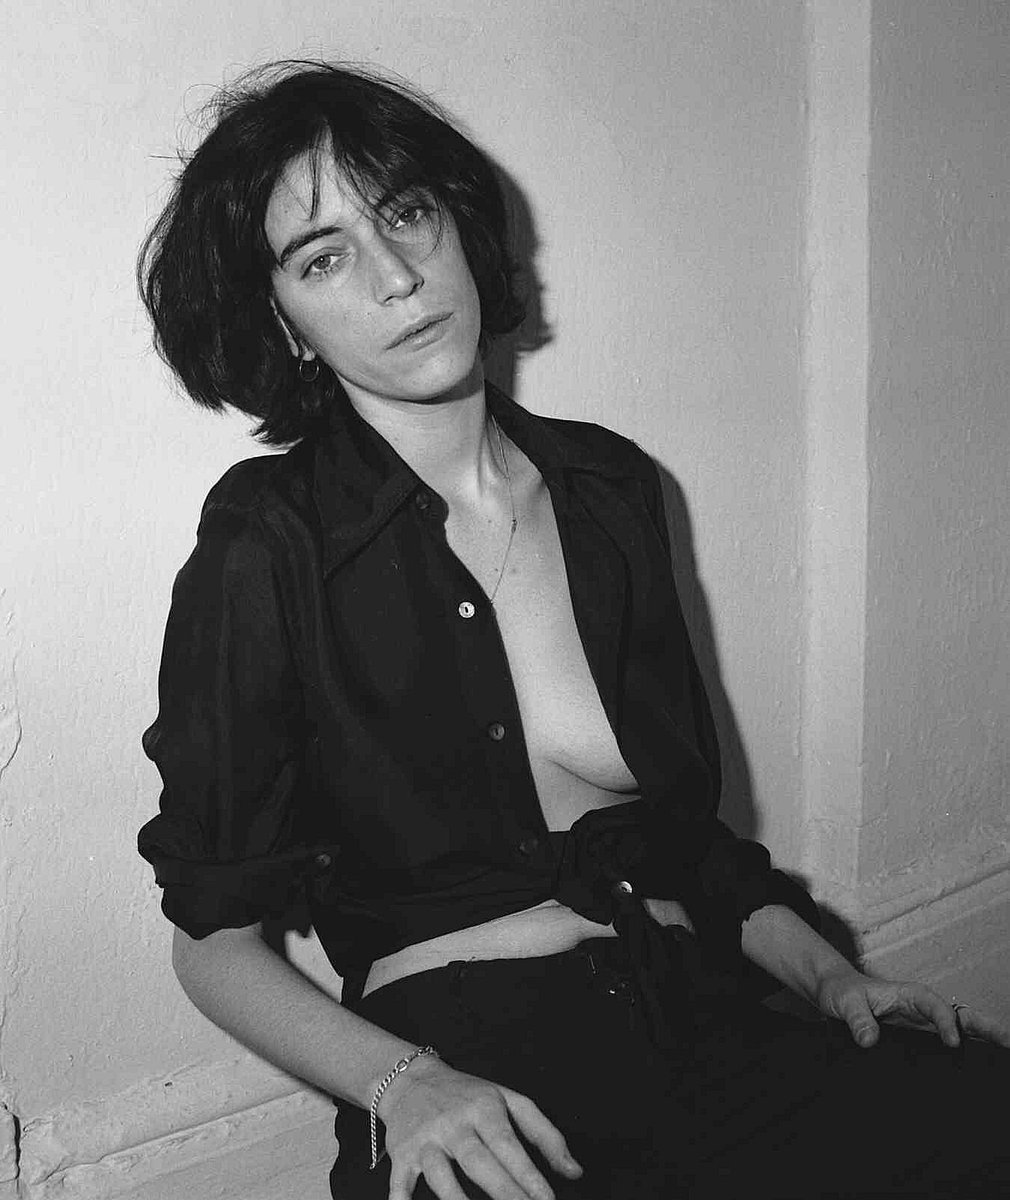 "Brian Eno on Twitter: ""Patti Smith, 1974 by Frank Stefanko ..."